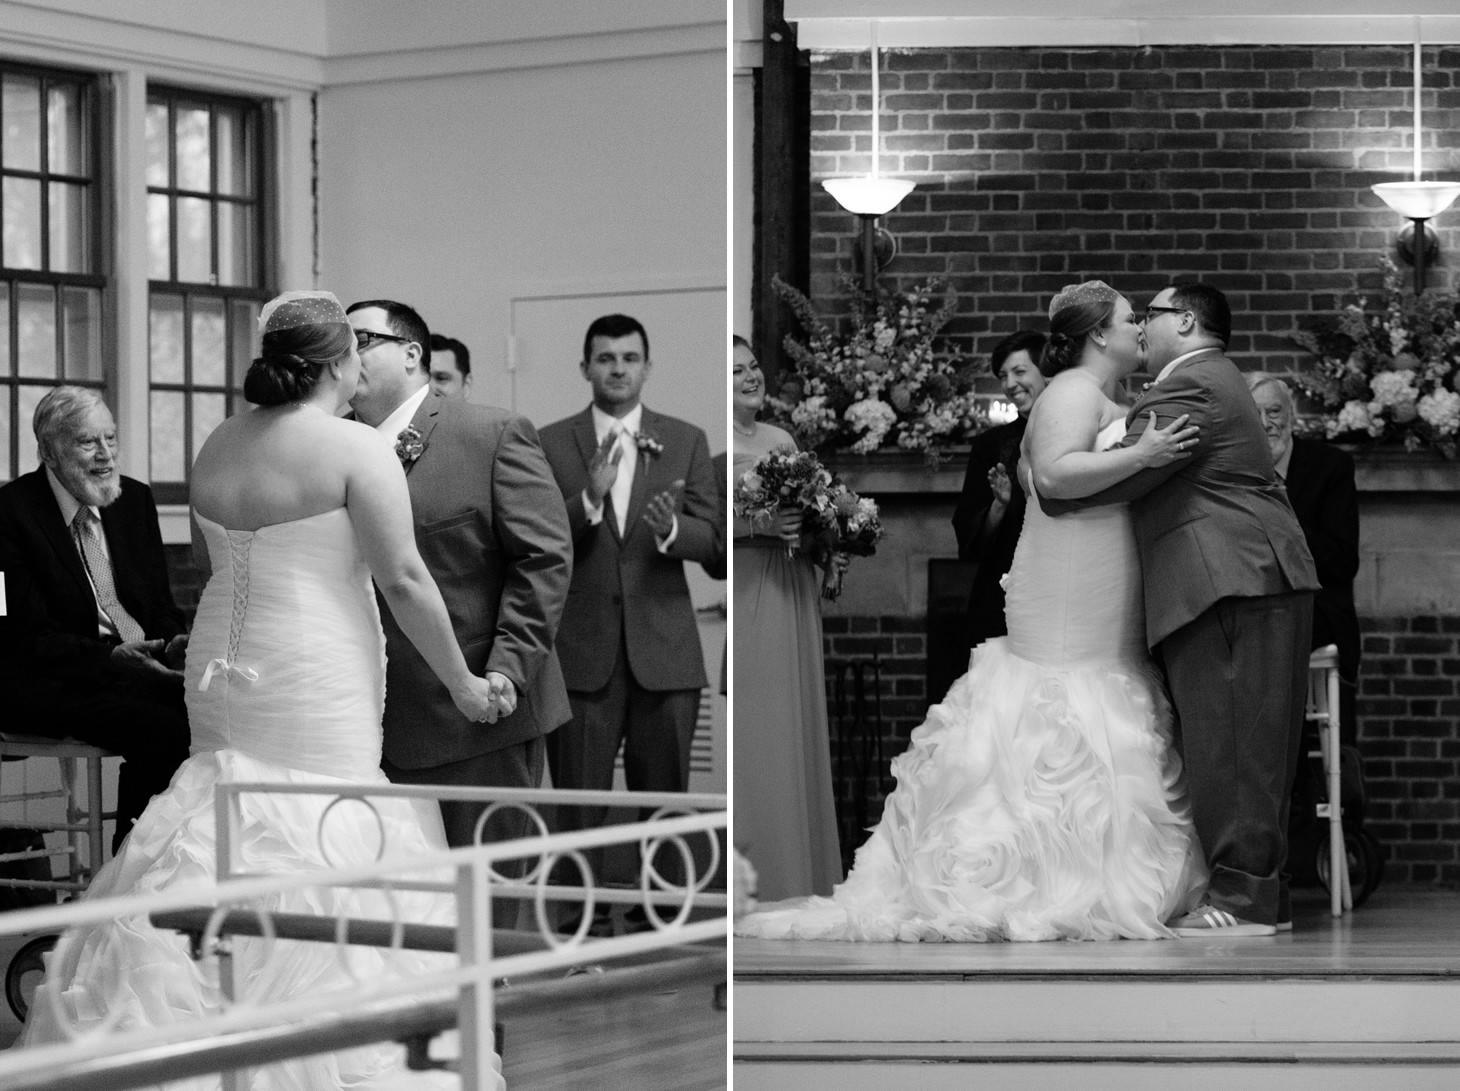 nyc-brooklyn-prospect-park-picnic-house-wedding-smitten-chickens-nerdy-40.jpg